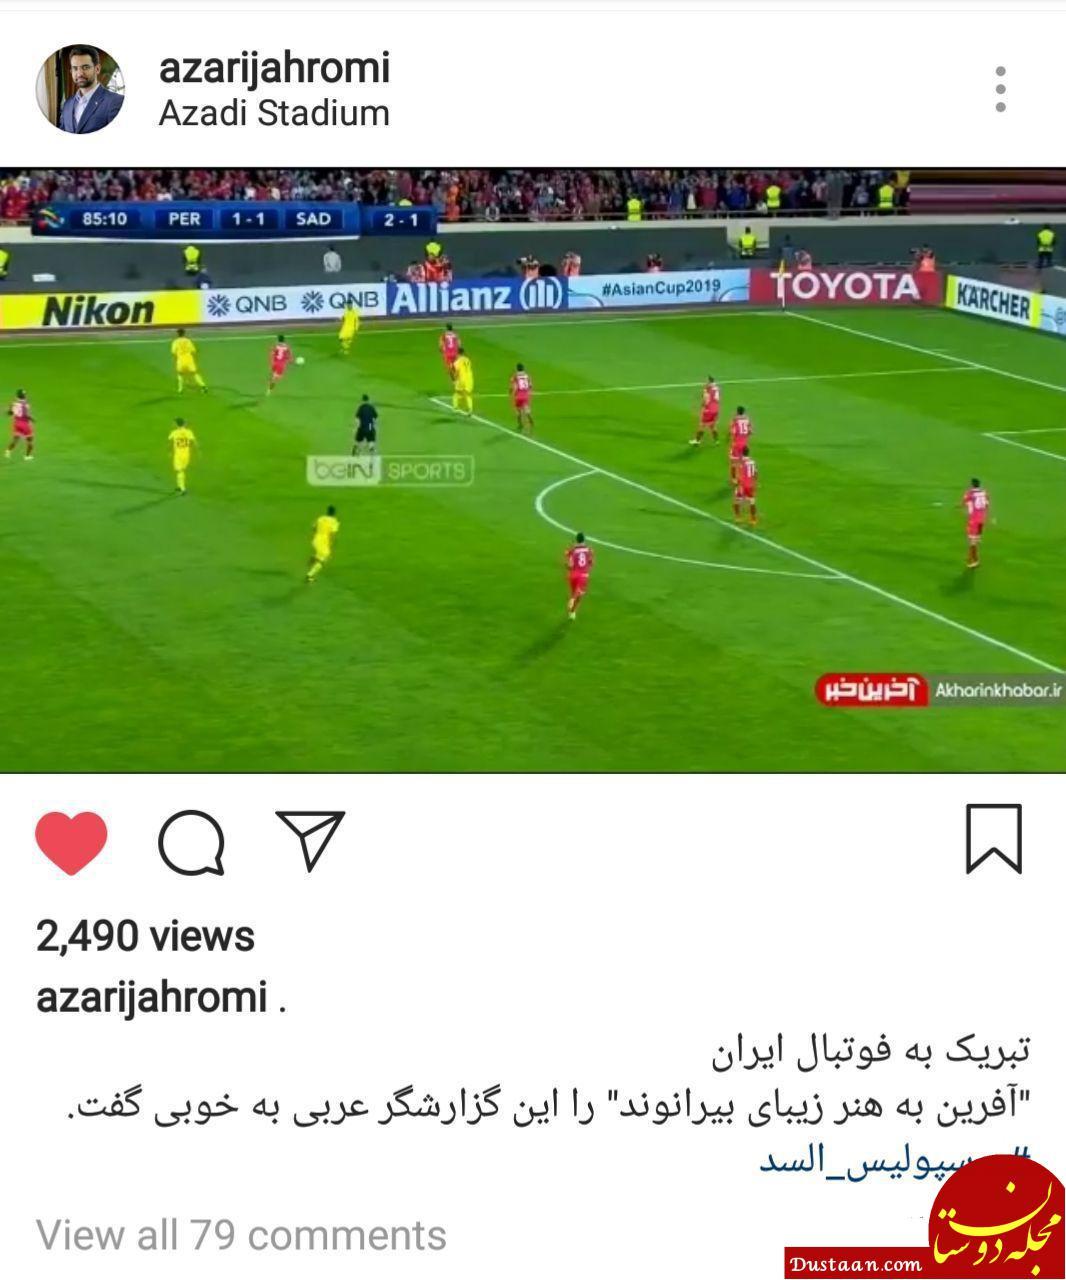 www.dustaan.com واکنش آذری جهرمی به برتری پرسپولیس مقابل السد